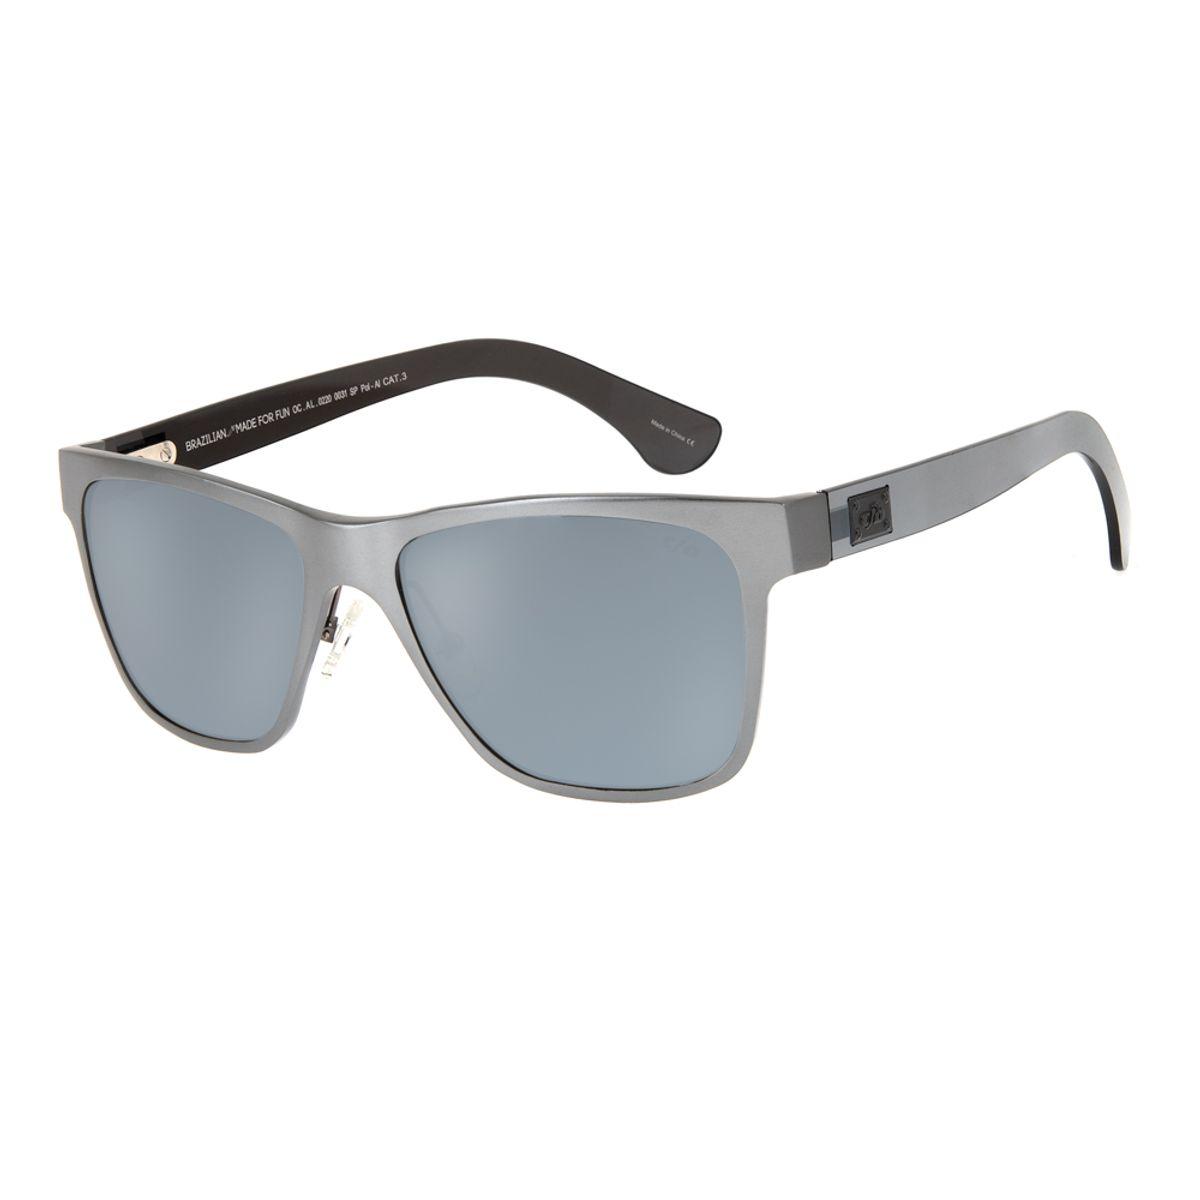 1de5e4eea Óculos de Sol Chilli Beans Masculino Esportivo Polarizado Cinza 0220 -  OC.AL.0220.0031 M